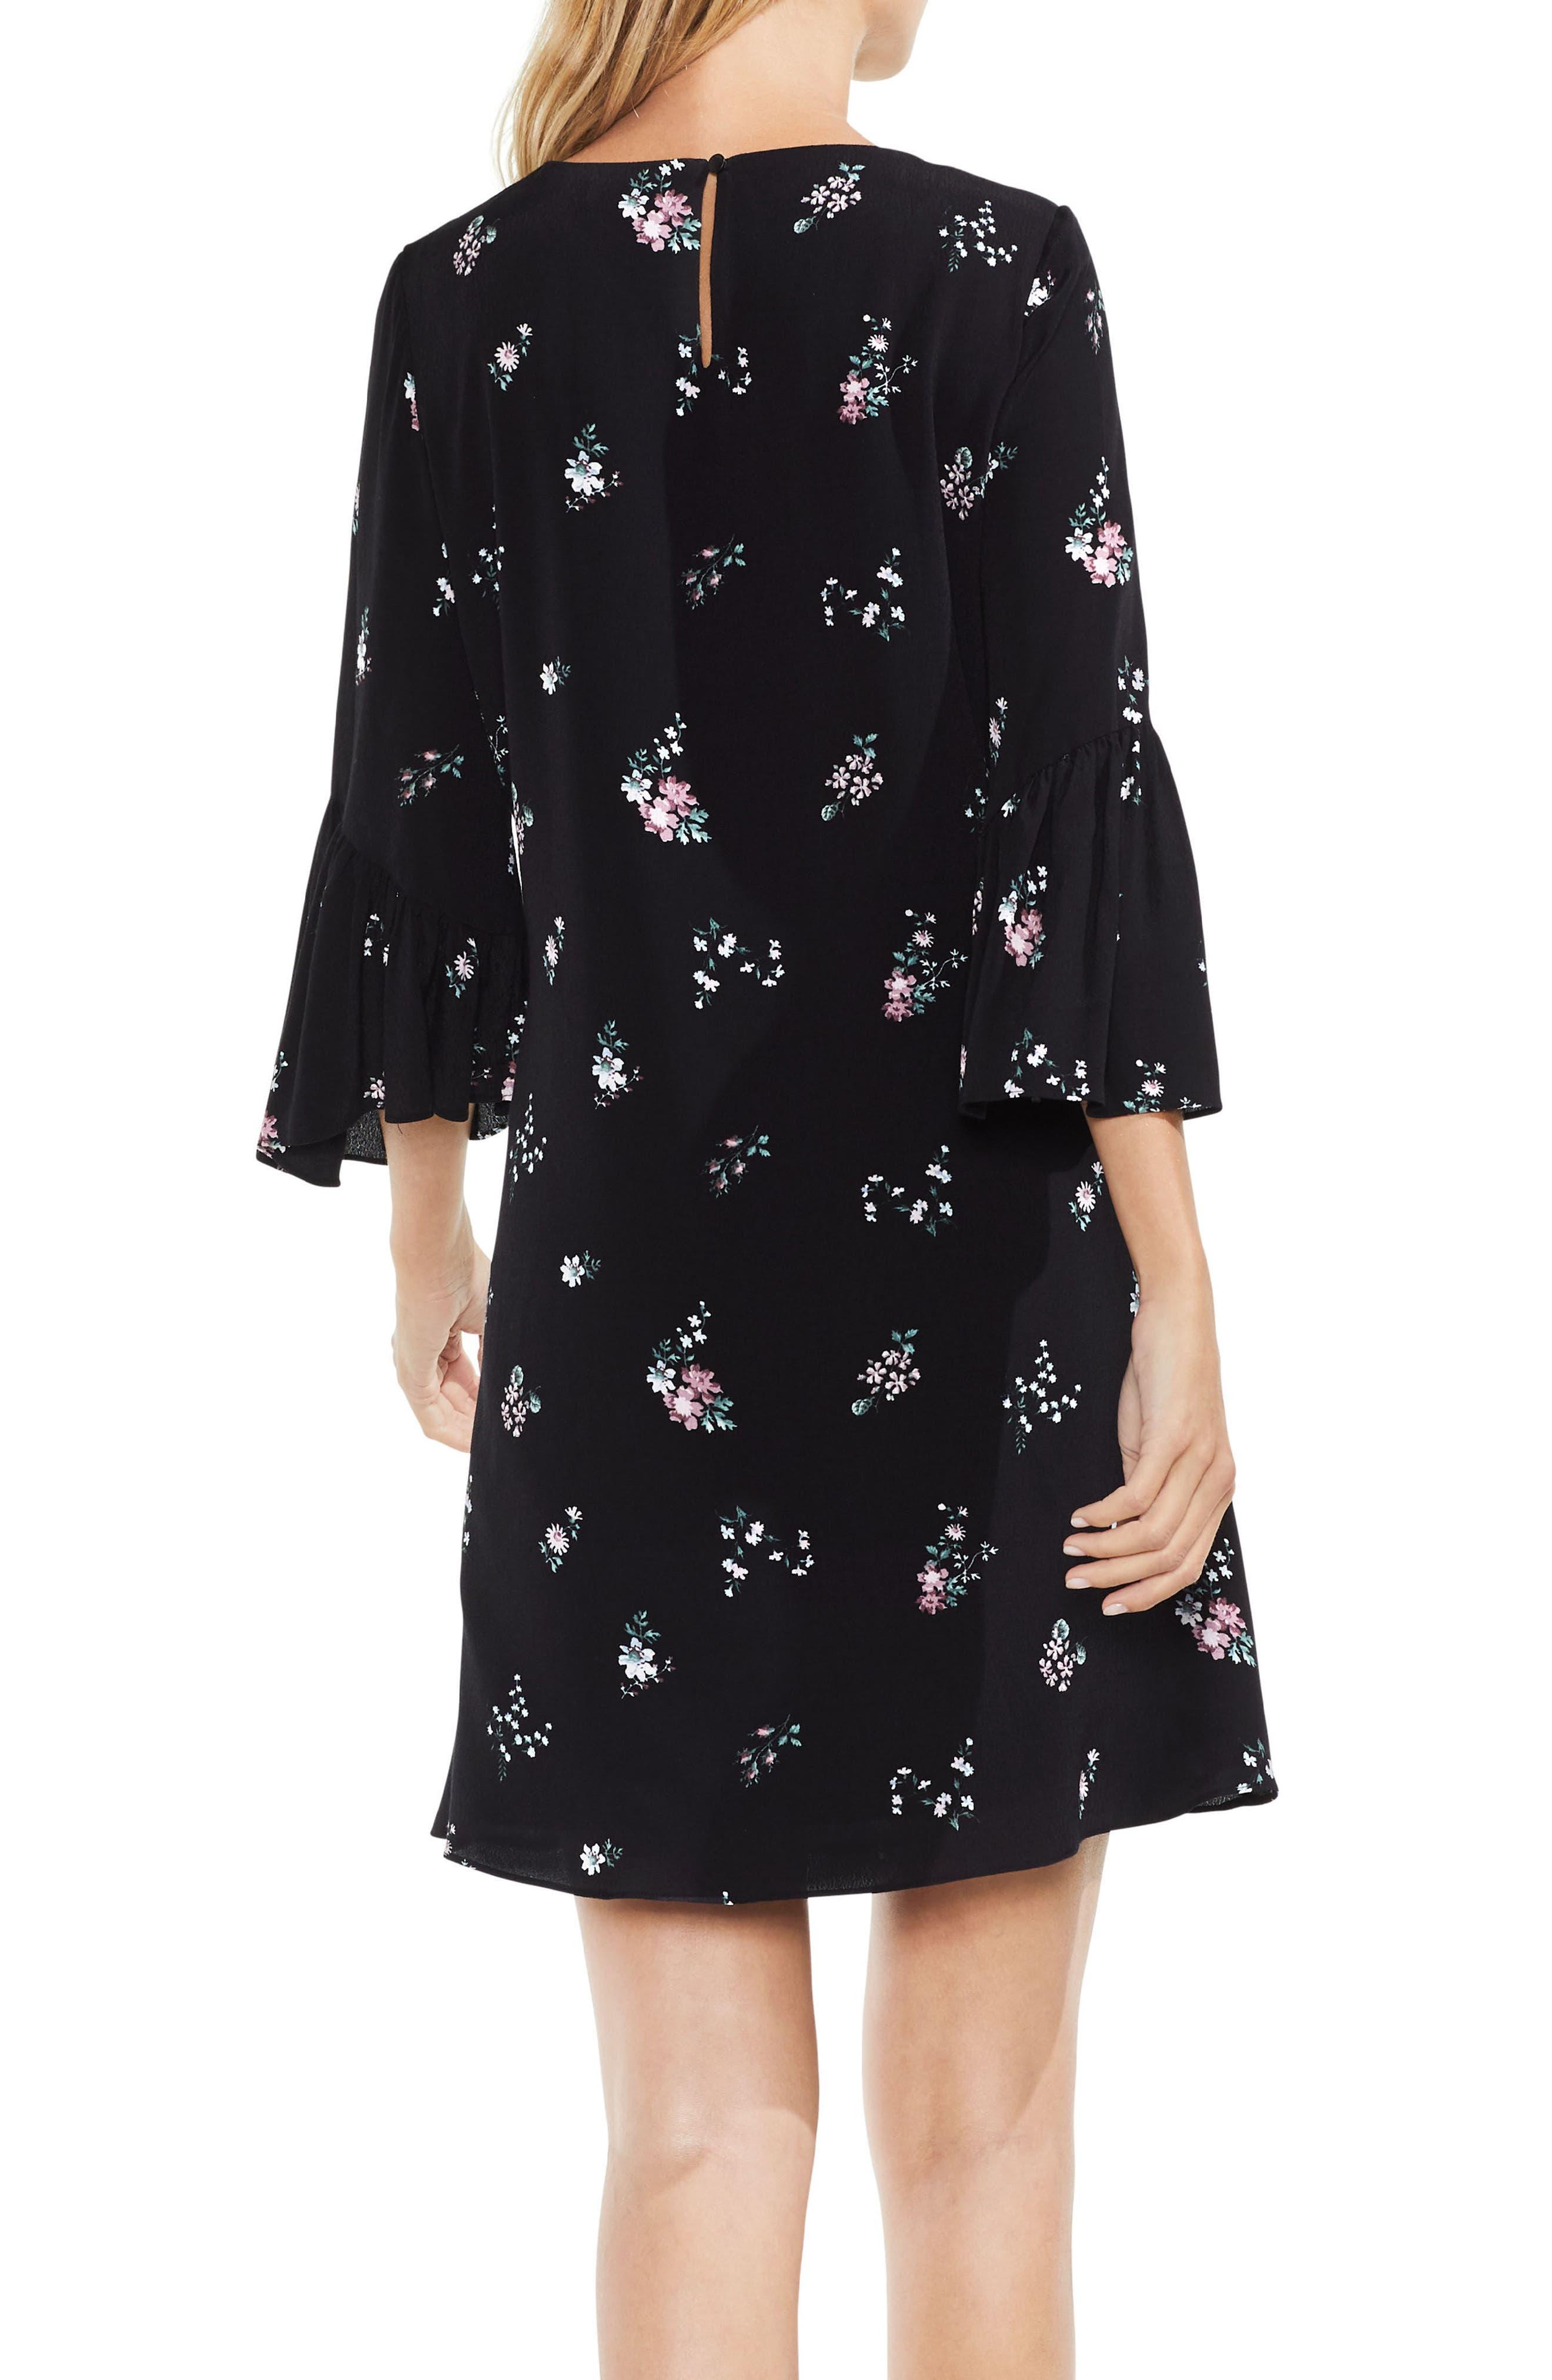 Ruffle Sleeve Floral Dress,                             Alternate thumbnail 2, color,                             Rich Black